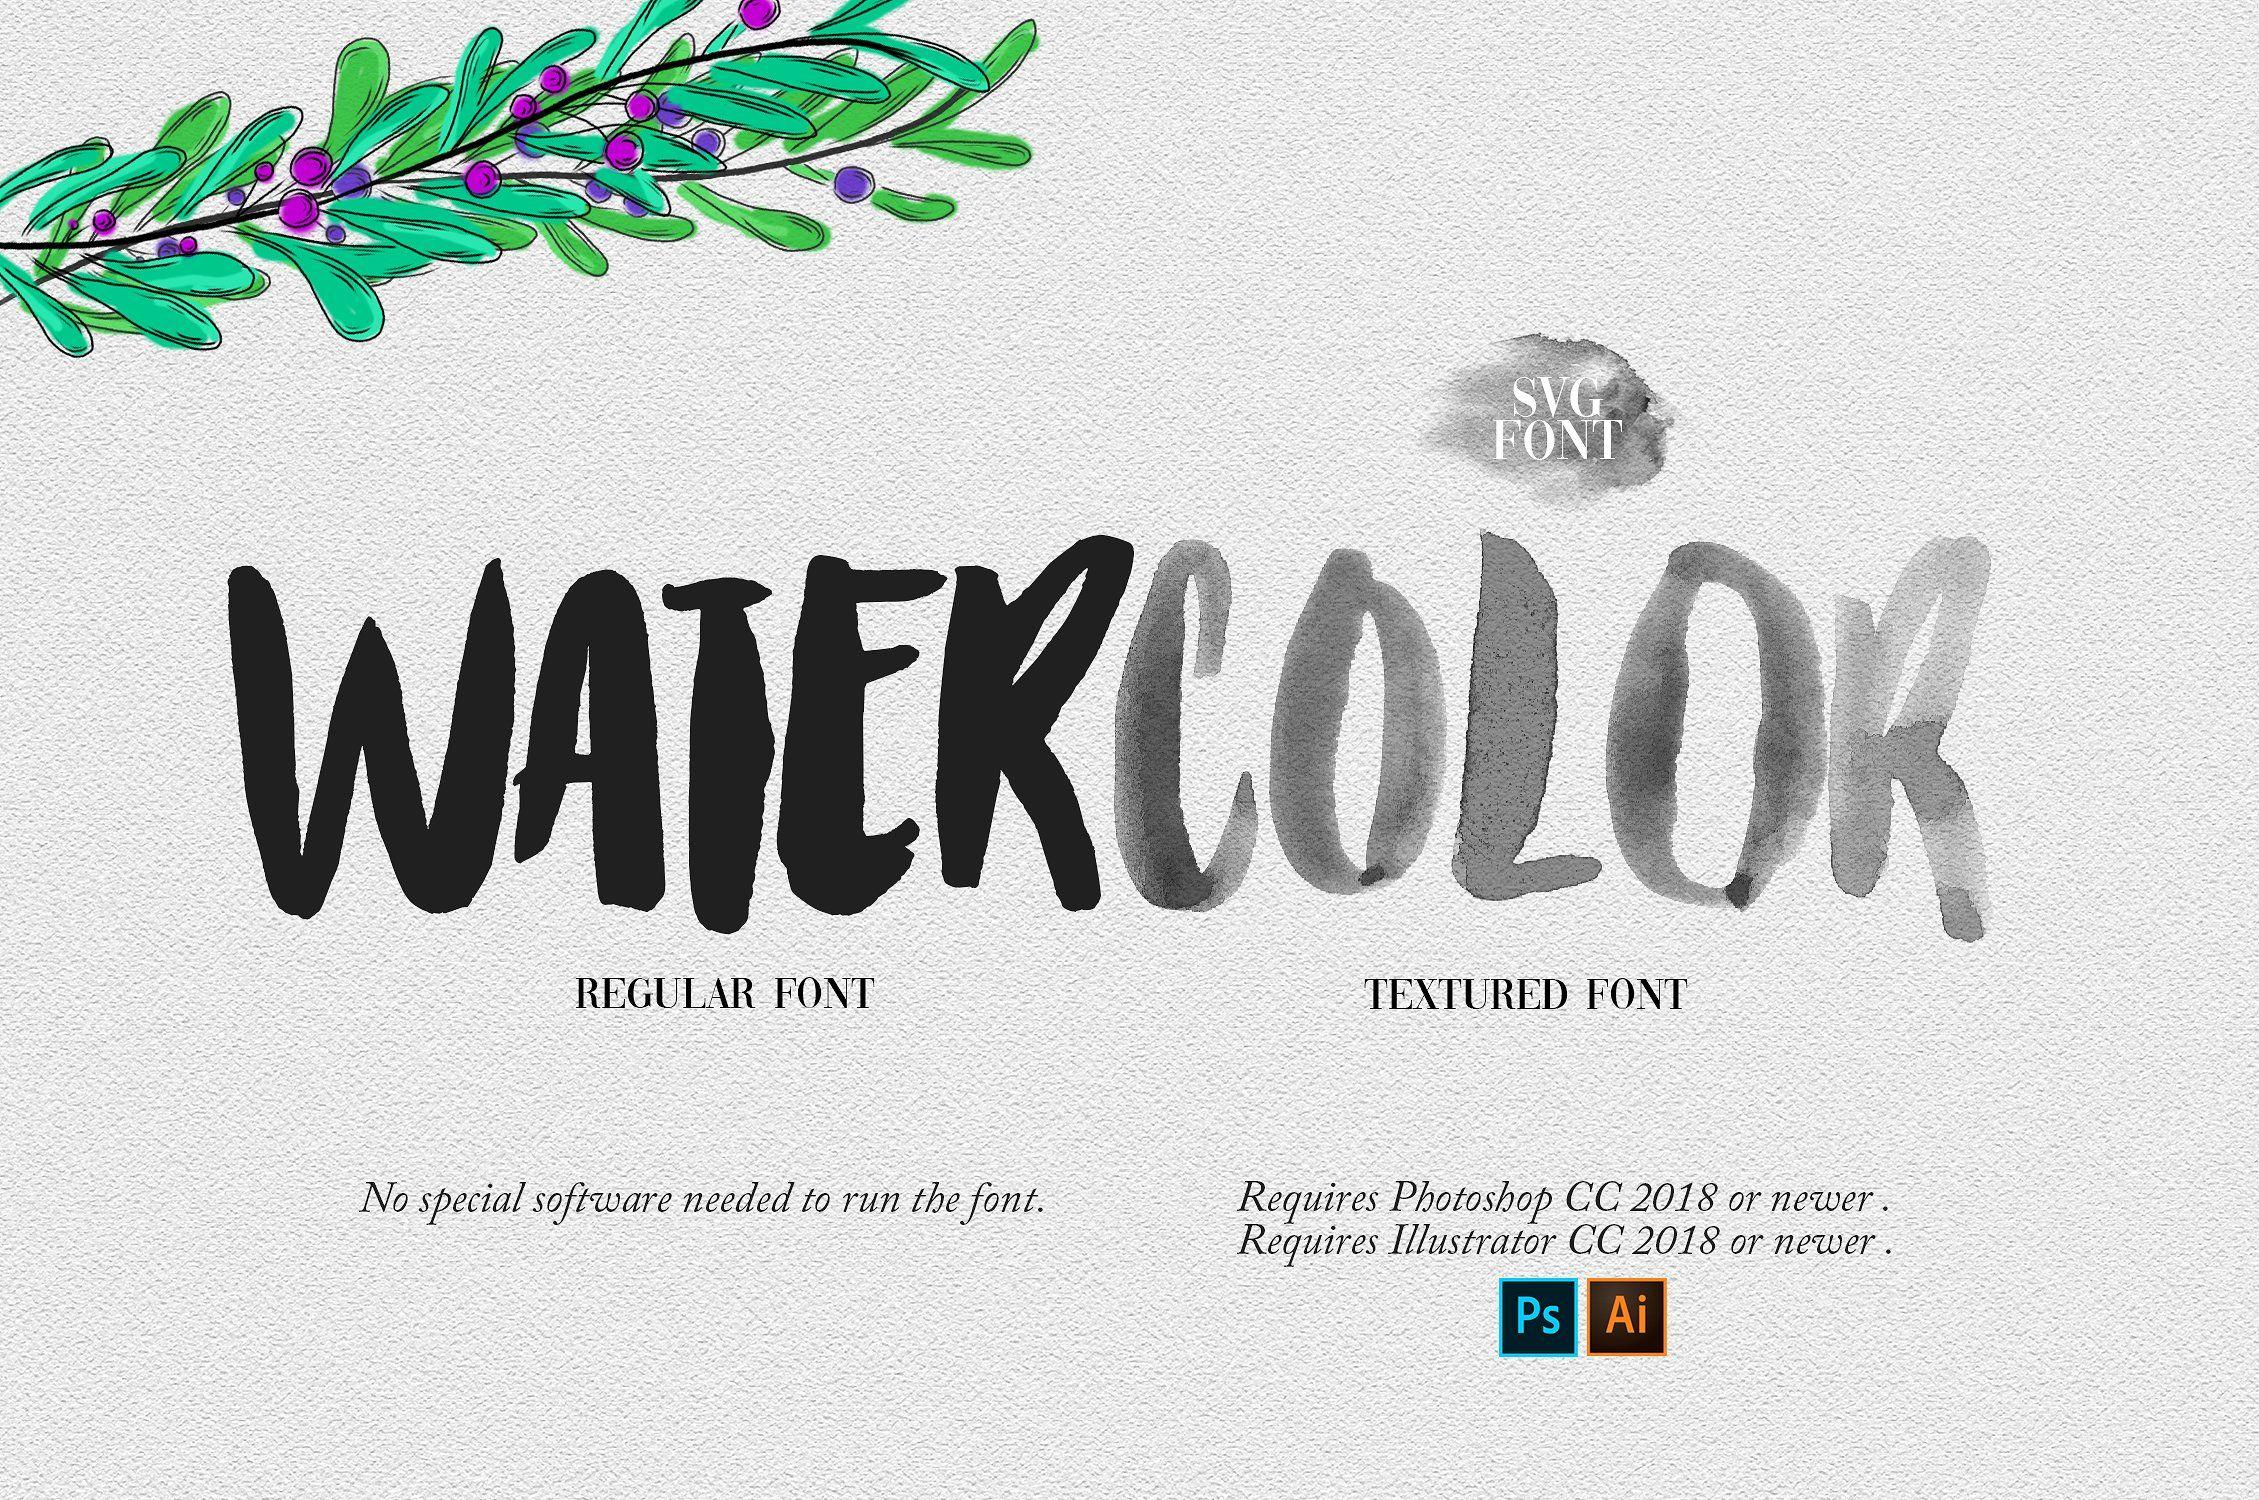 Watercolor OpentypeSVG Font Watercolor font, New fonts